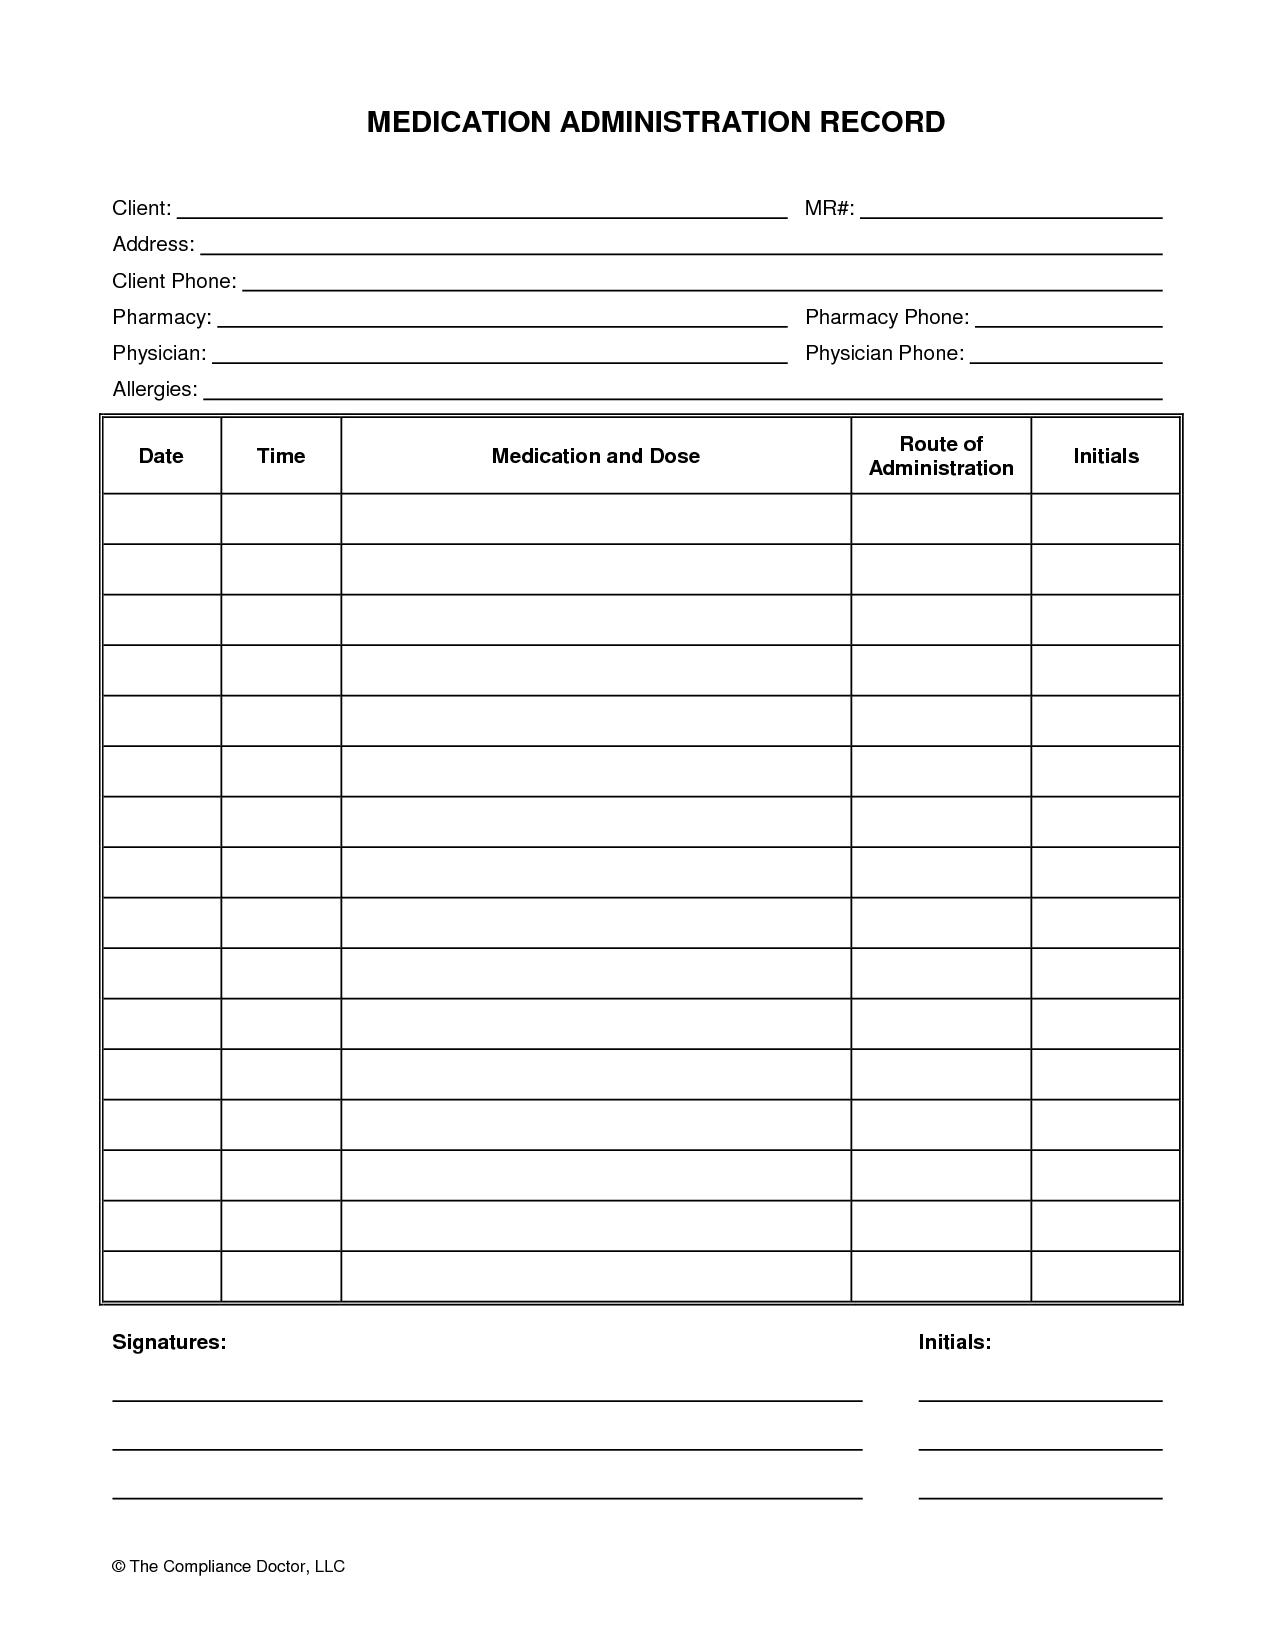 Medication Administration Record Form | Organization | Medication - Free Printable Daily Medication Chart